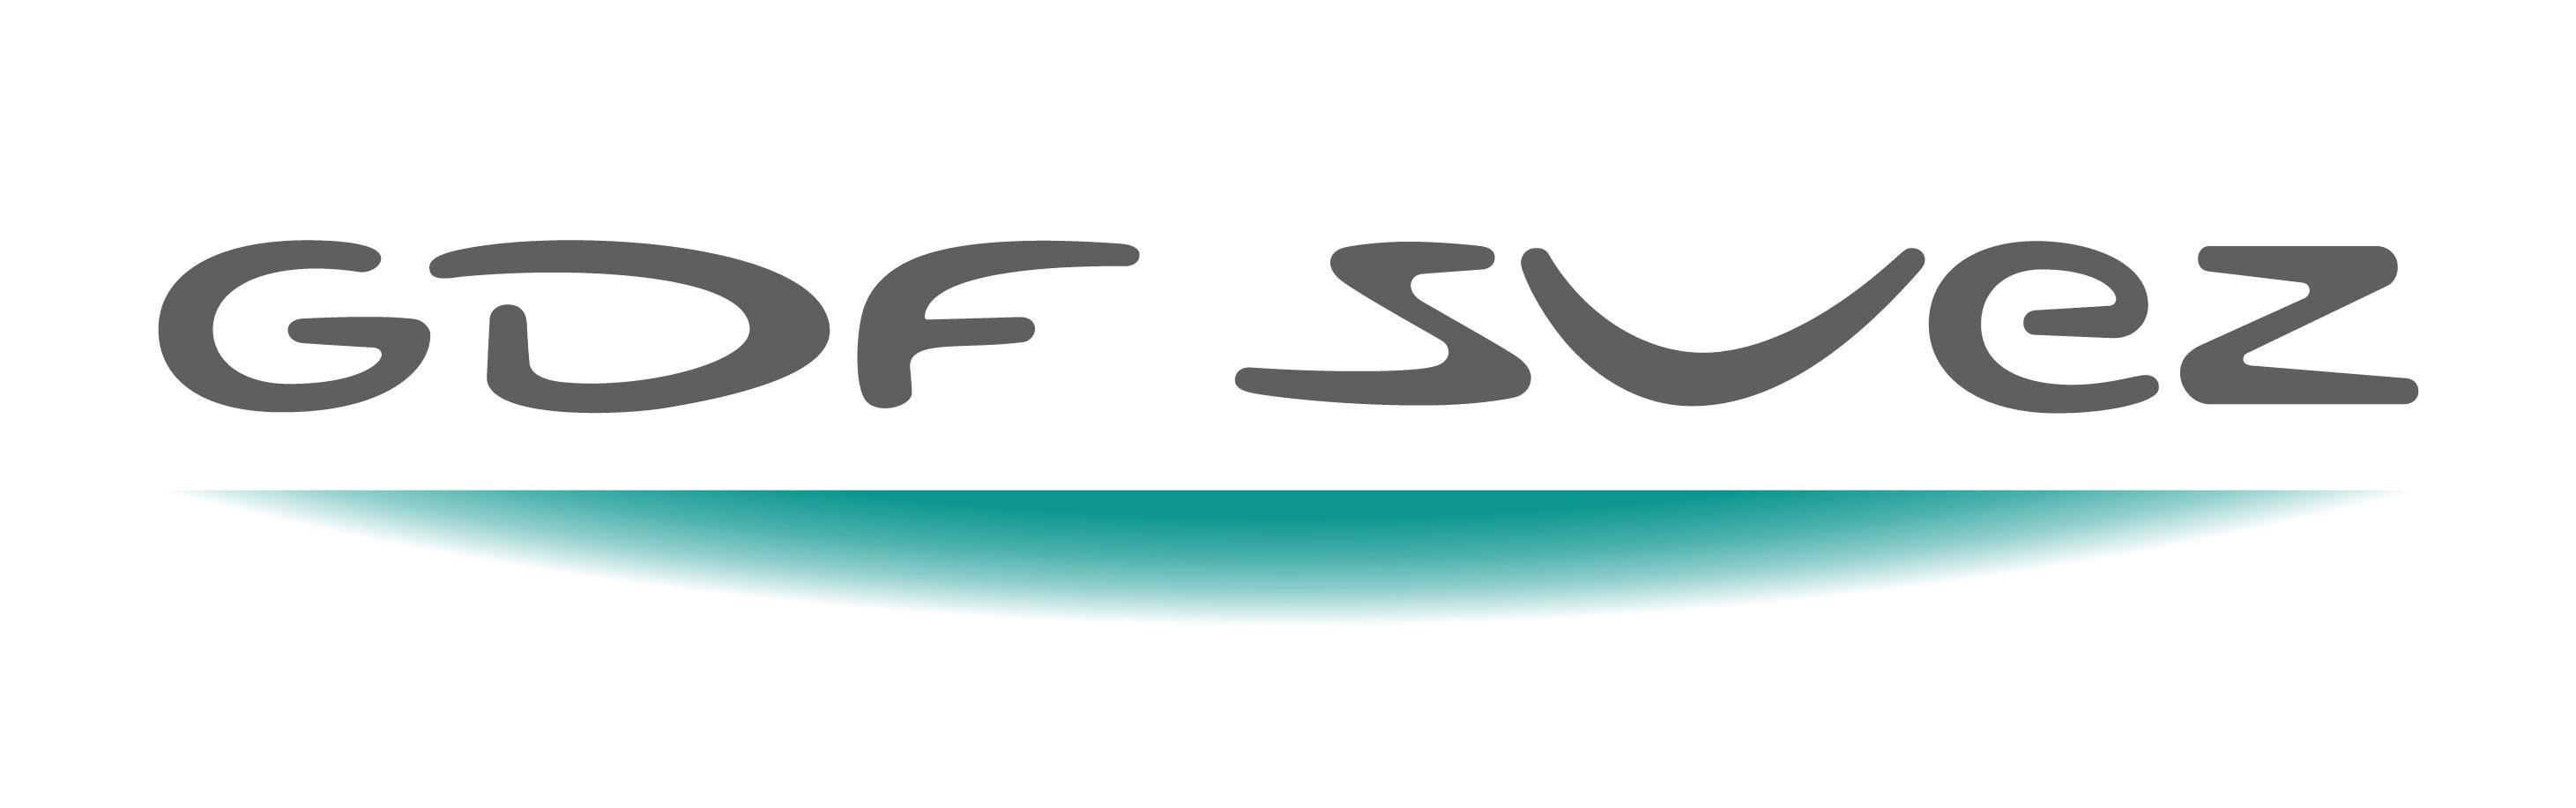 GDF Suez company logo